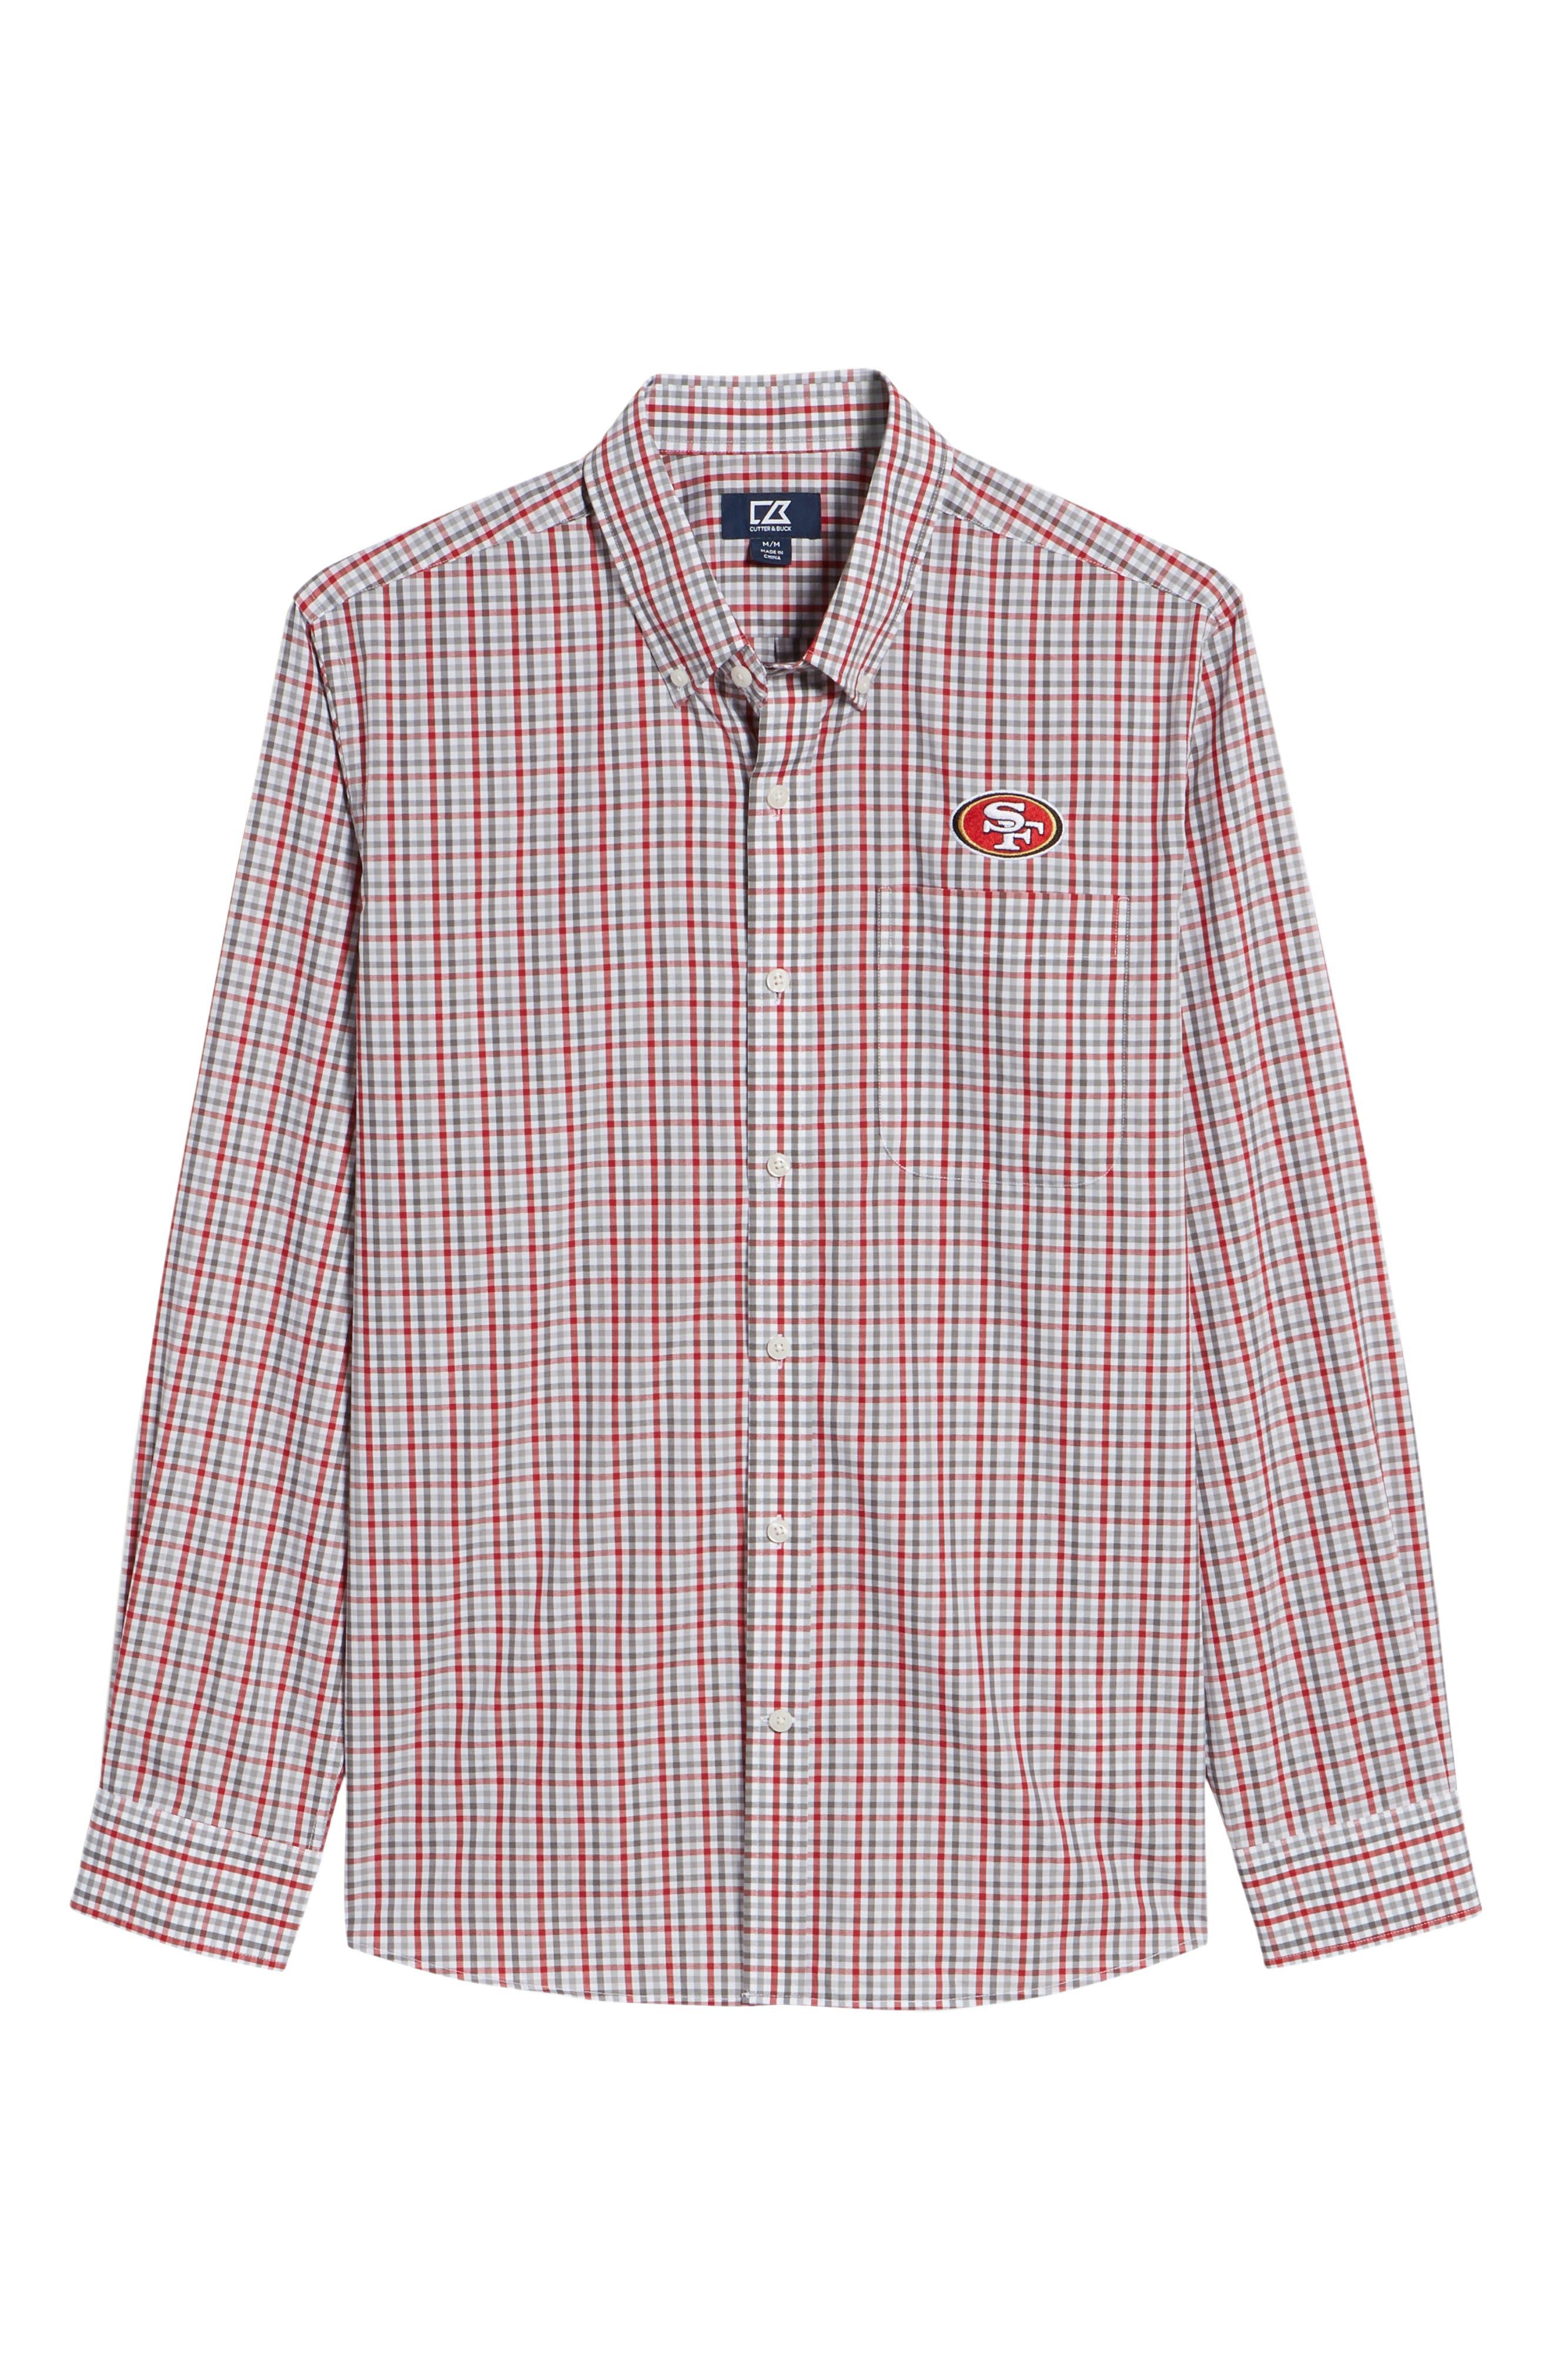 San Francisco 49ers - Gilman Regular Fit Plaid Sport Shirt,                             Alternate thumbnail 6, color,                             CARDINAL RED